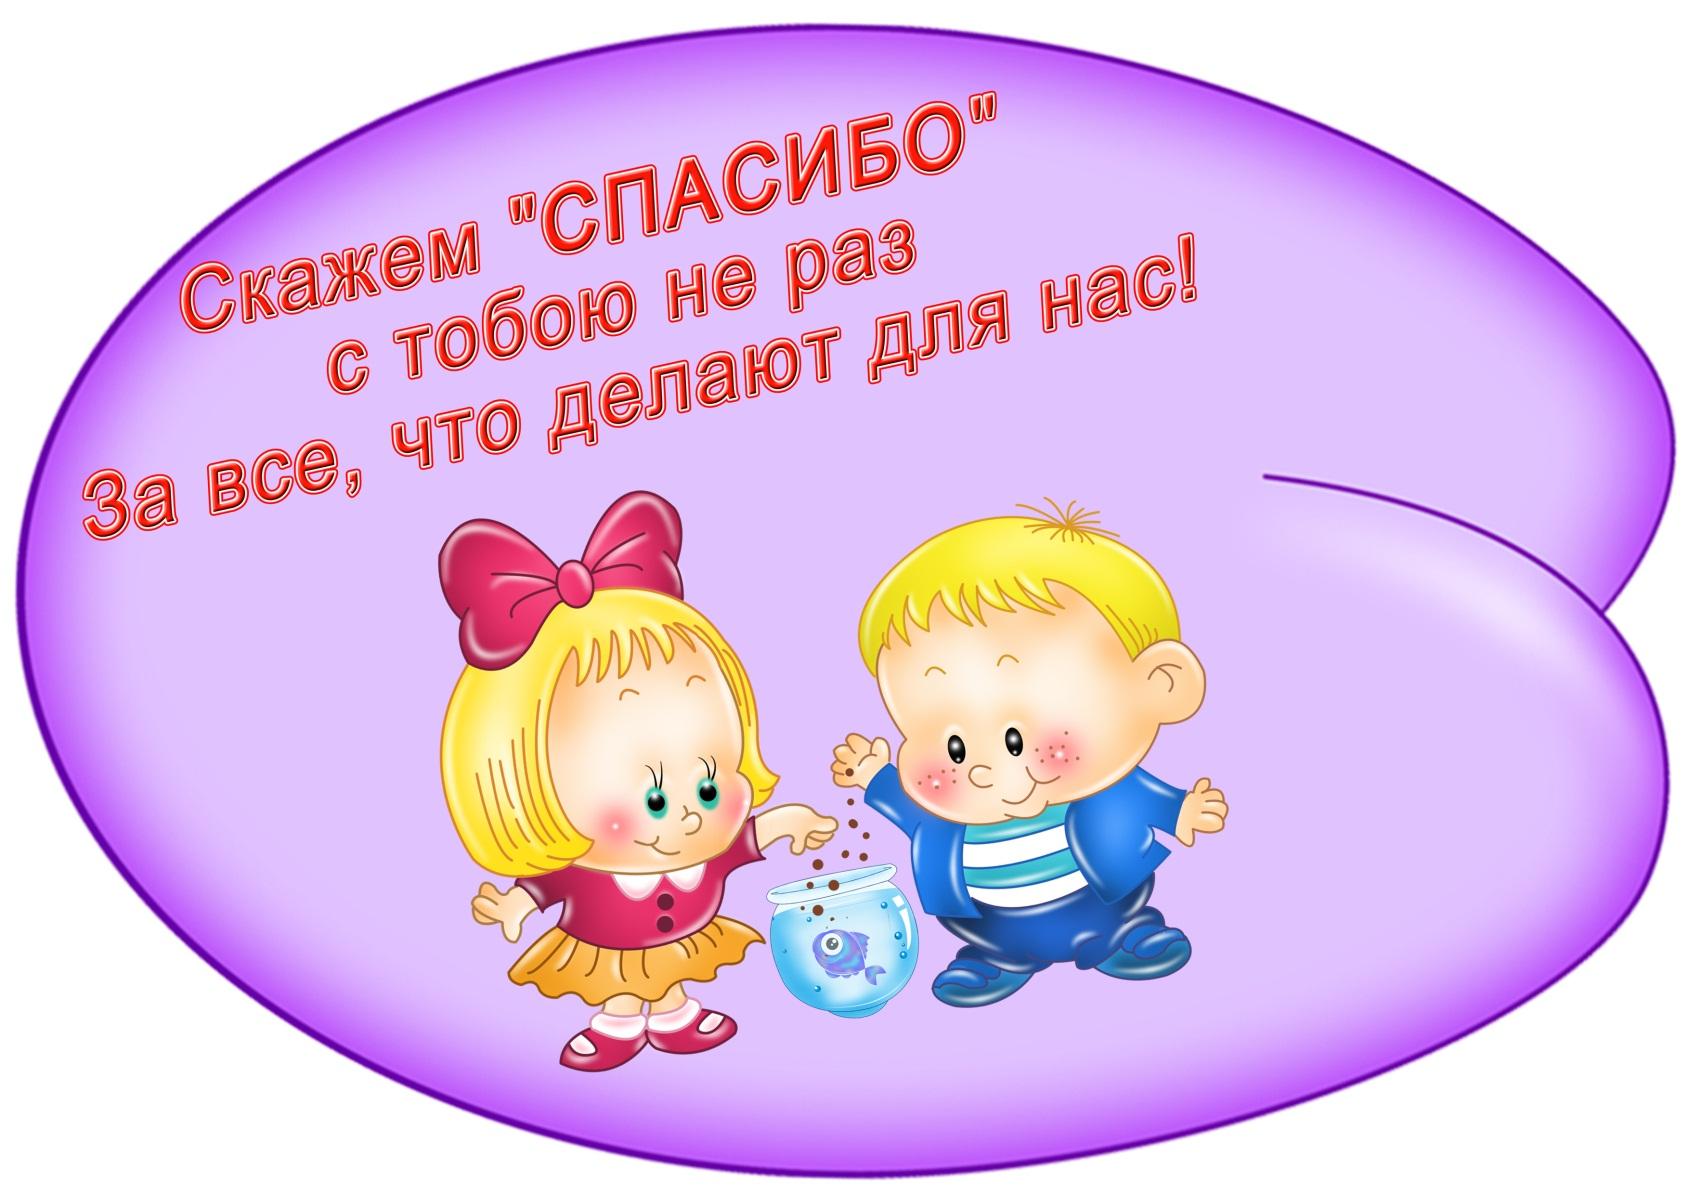 Картинки правила вежливости для детей